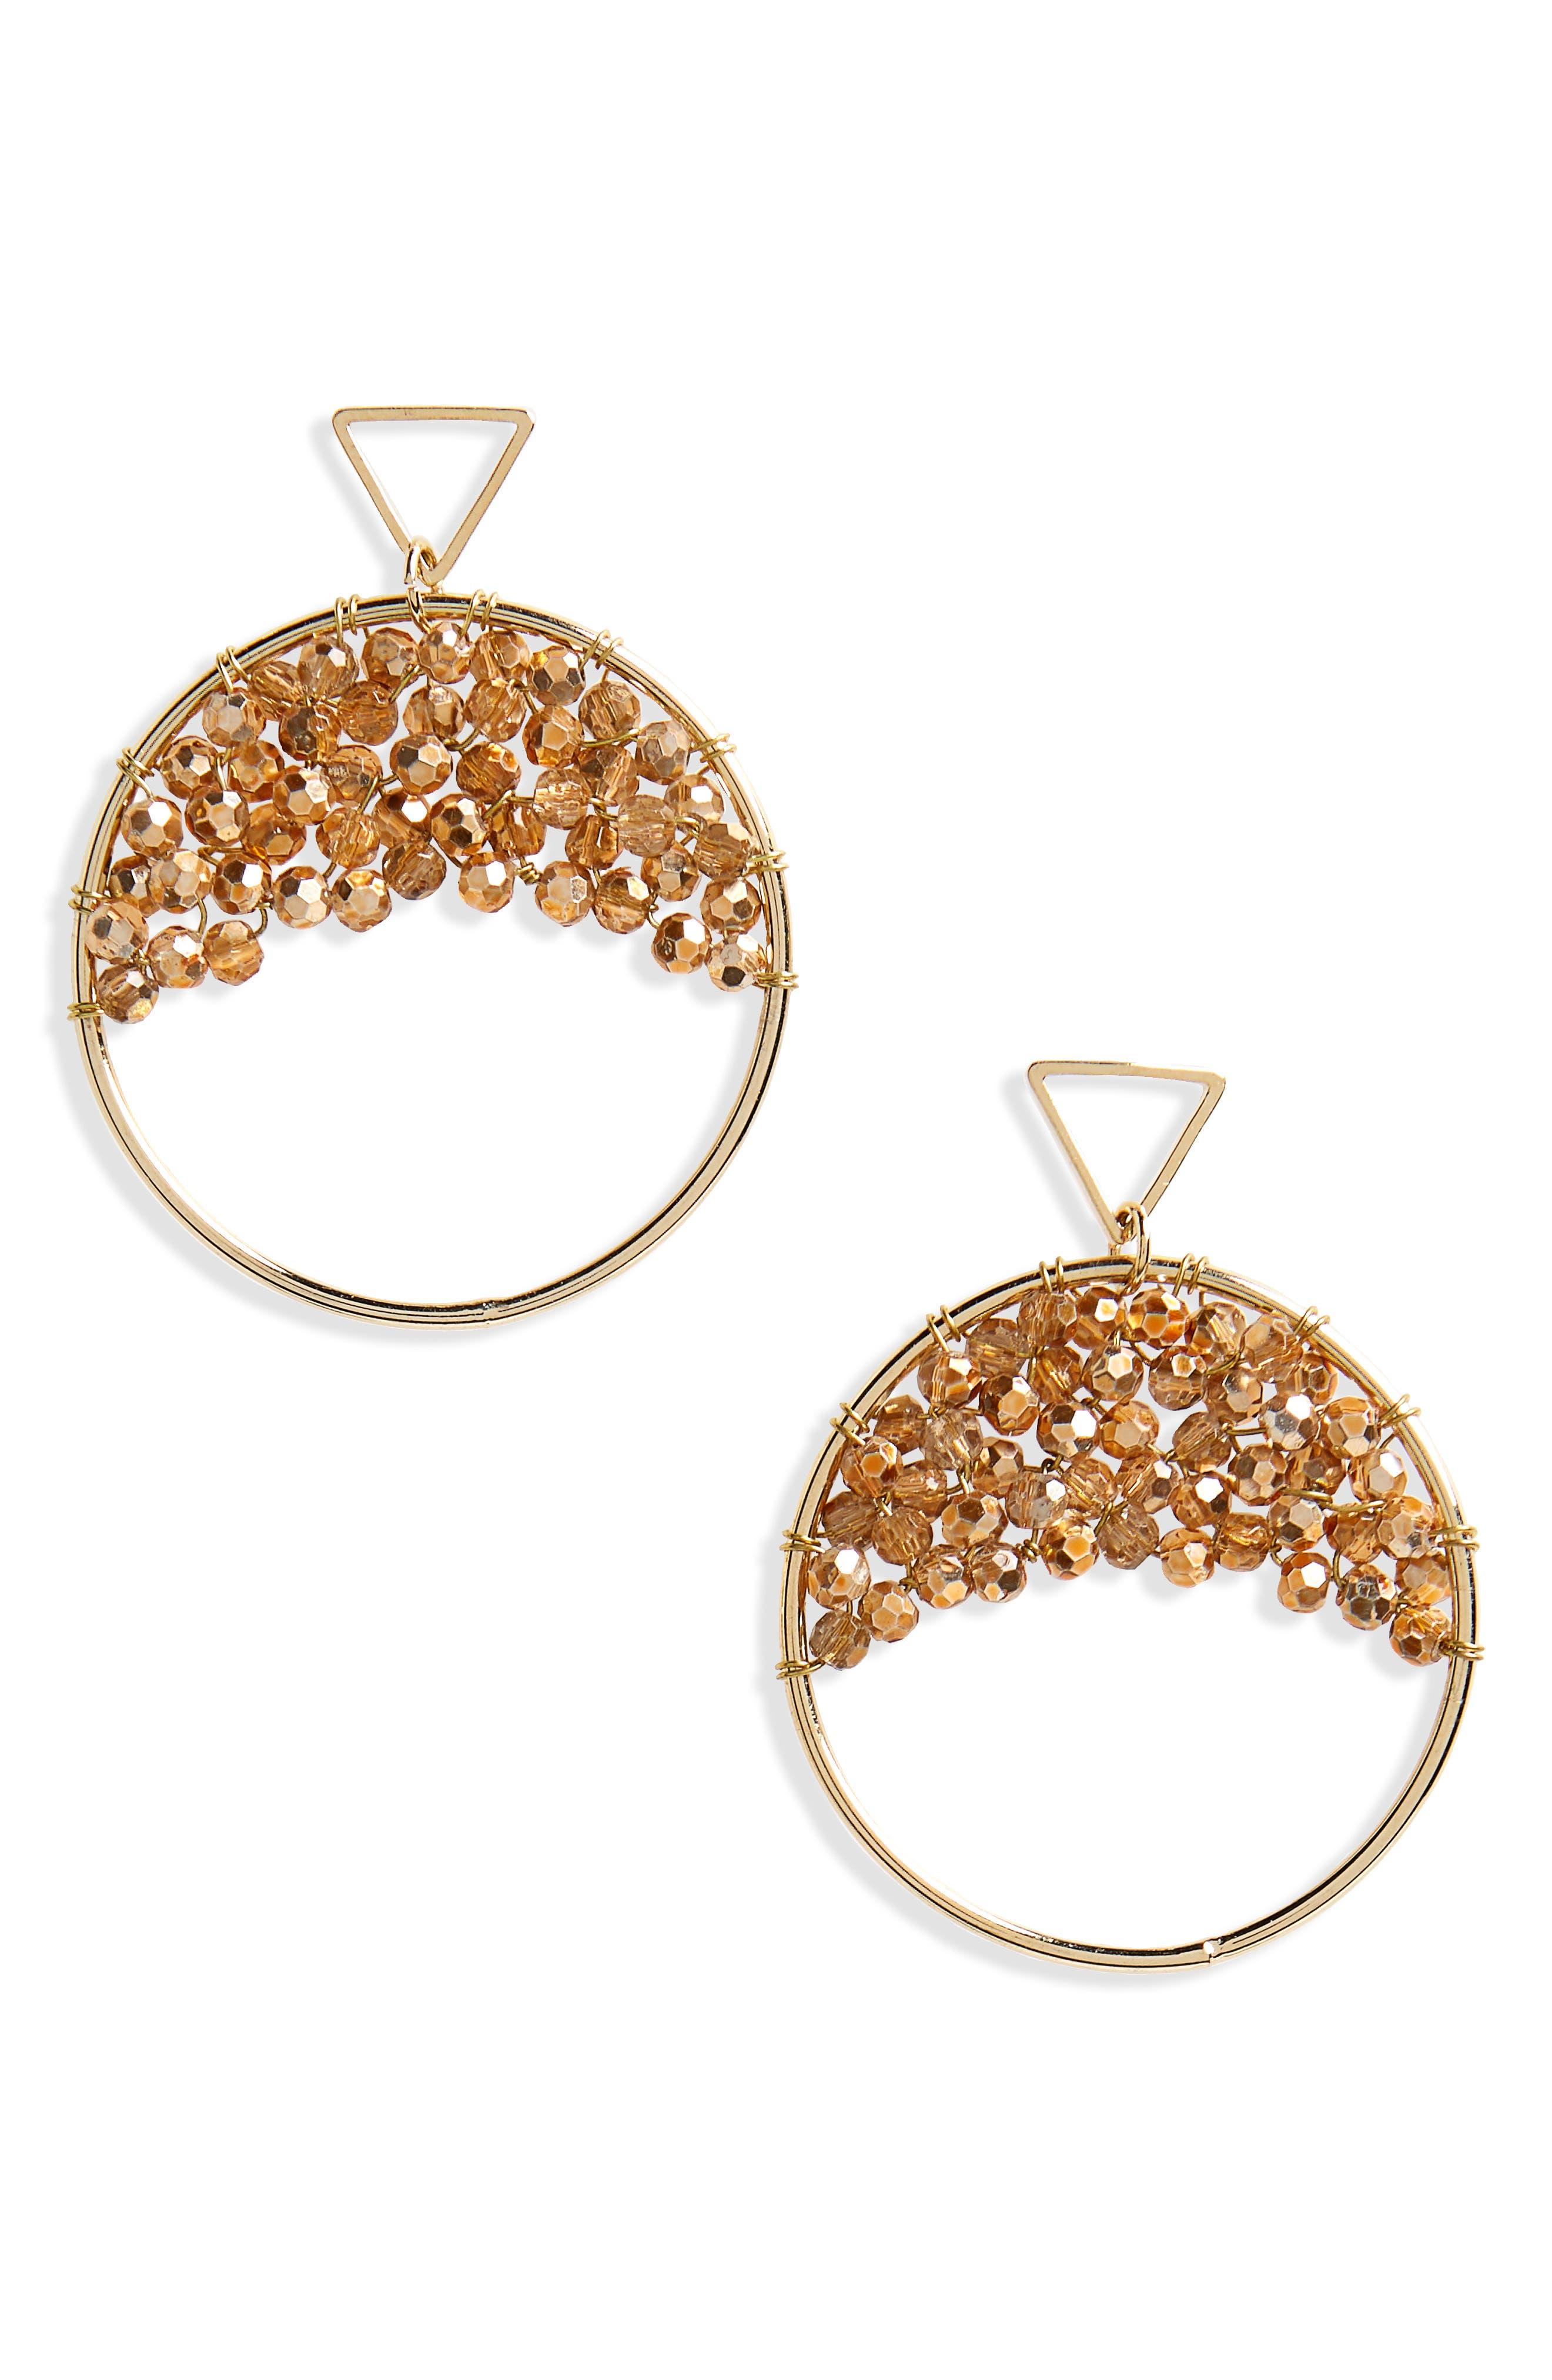 Crystal Beaded Circle Earrings,                             Main thumbnail 1, color,                             CHAMPAGNE